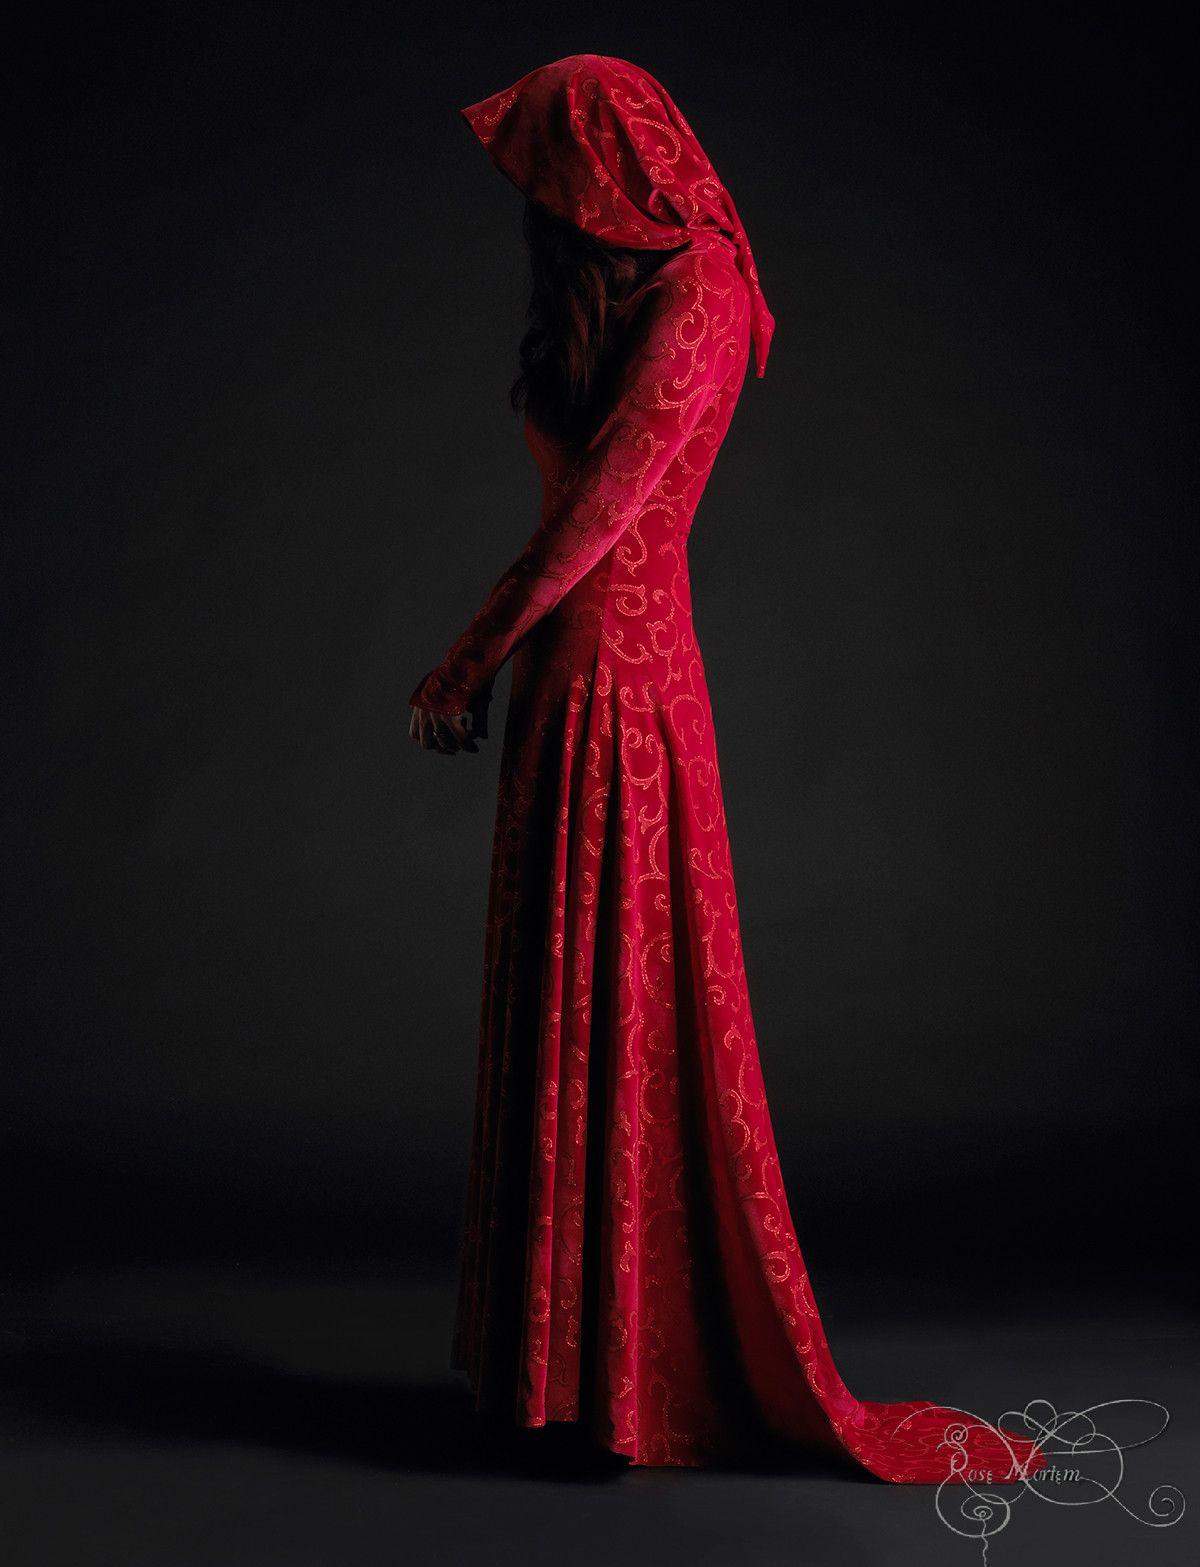 dc789e4b2 Calista Hooded Dress - Red Riding Hood Fairy Tale Gothic Vampire Dress